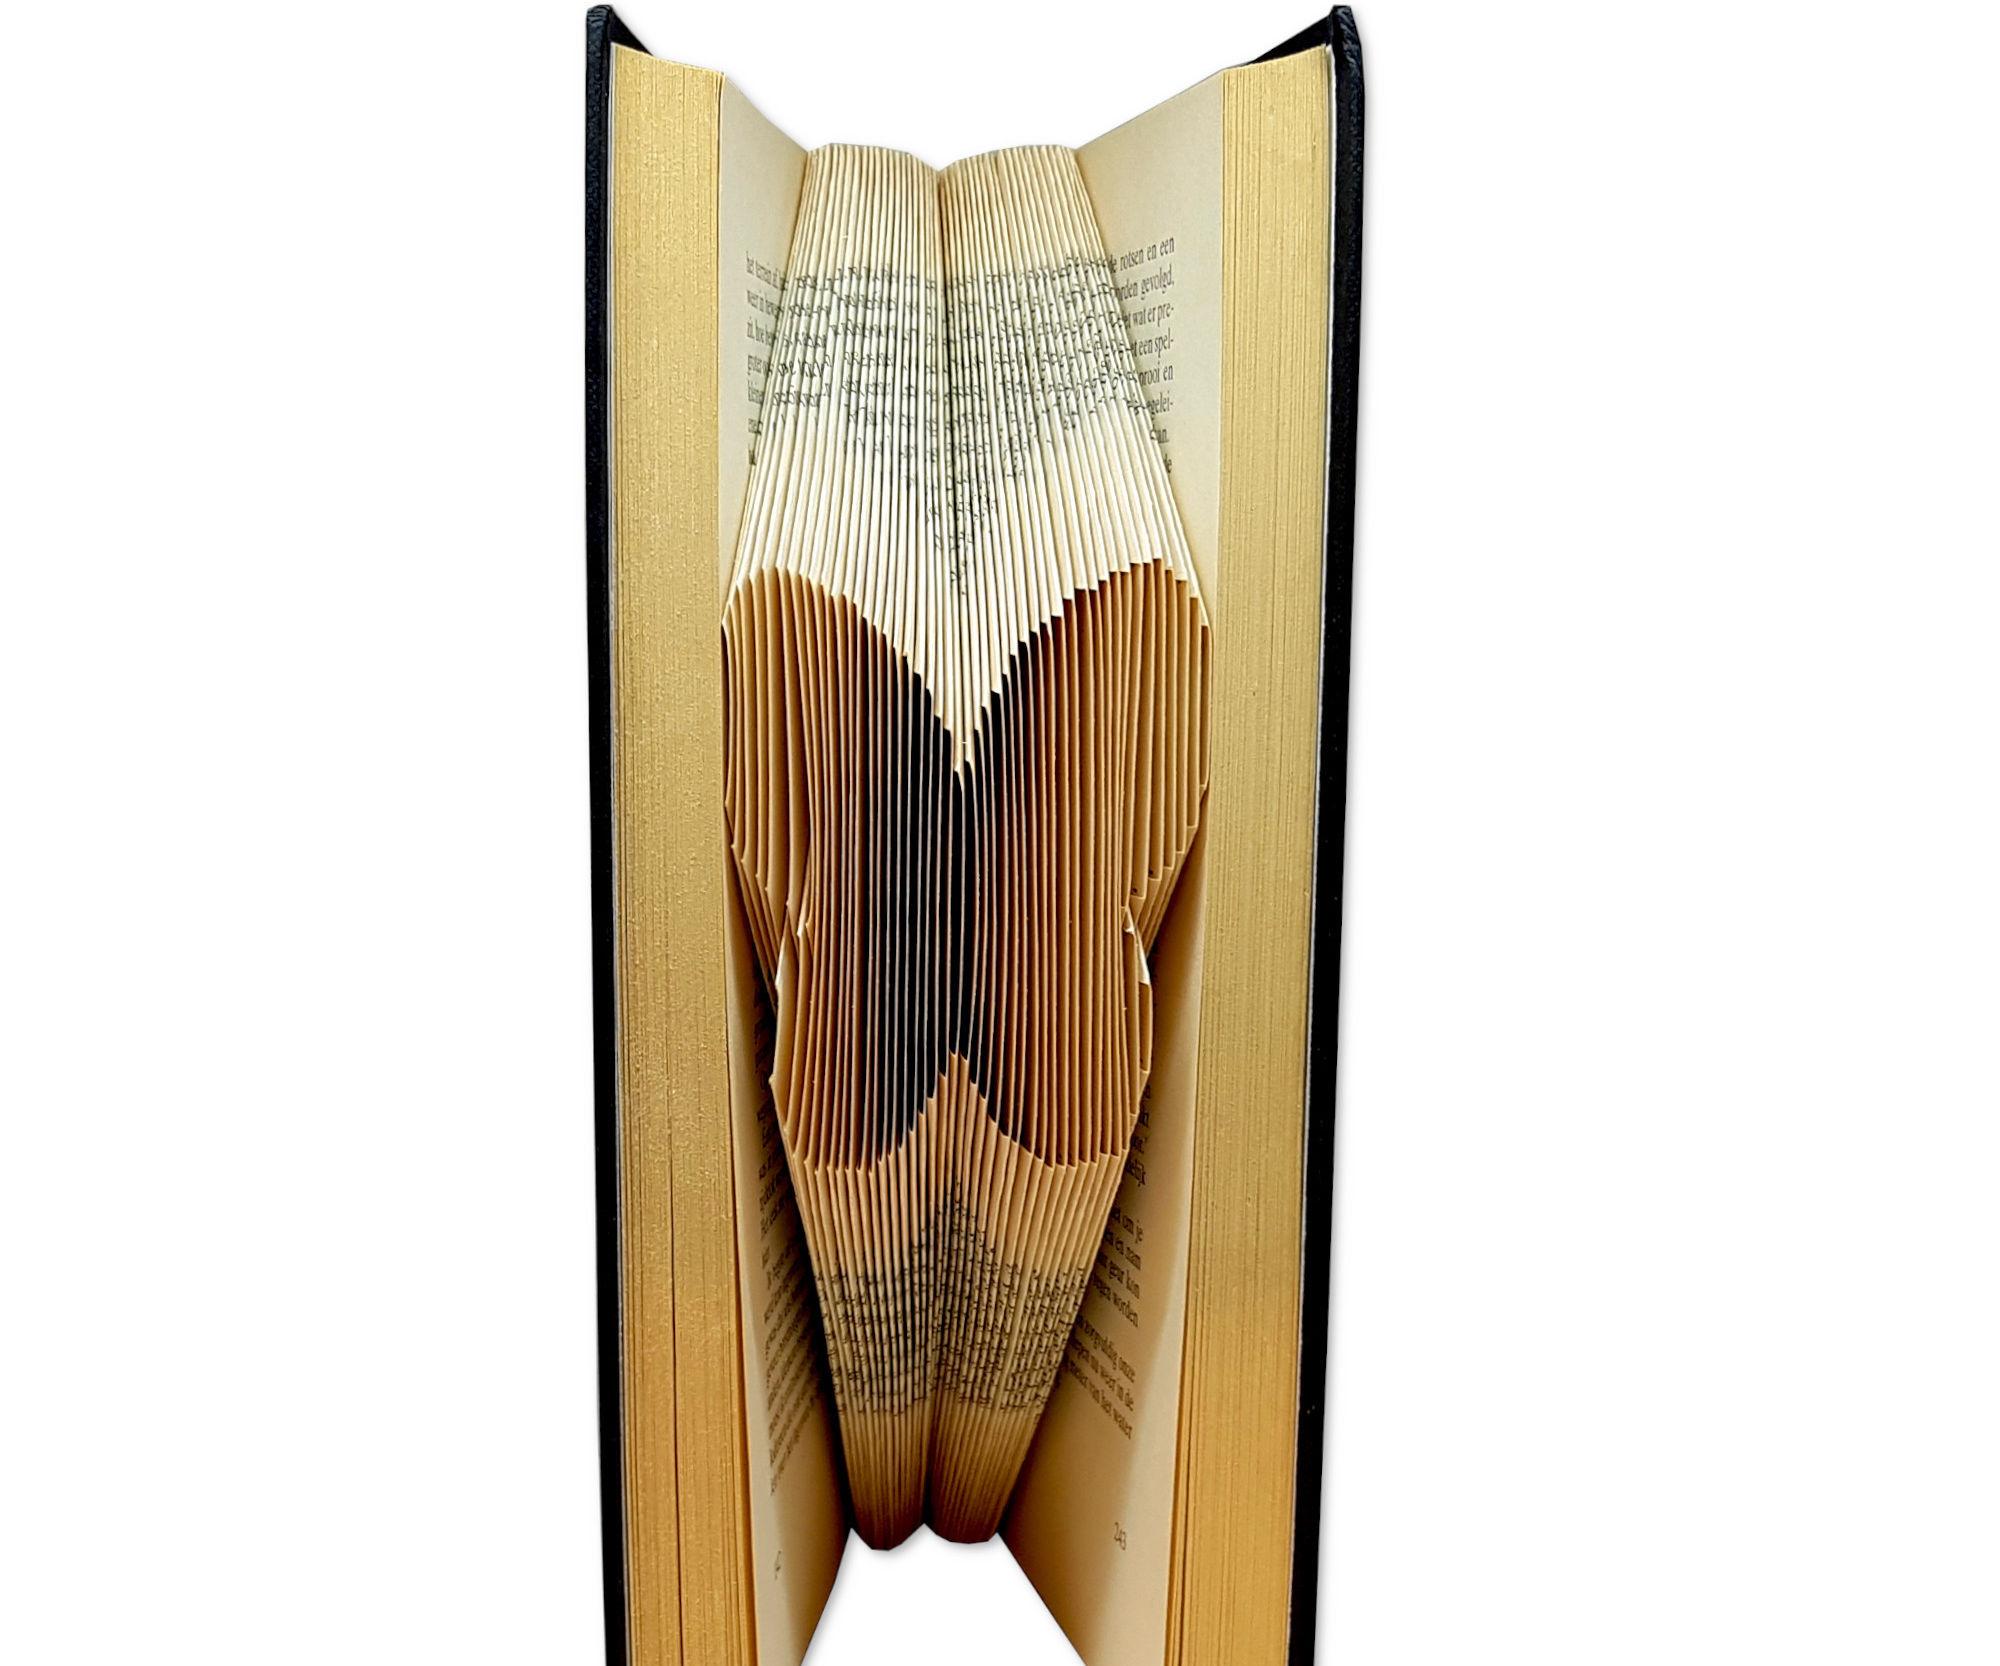 Create Your Own Piece of Folded Book Art - Bookfolding Pattern Butterfly - Free Online Workshop